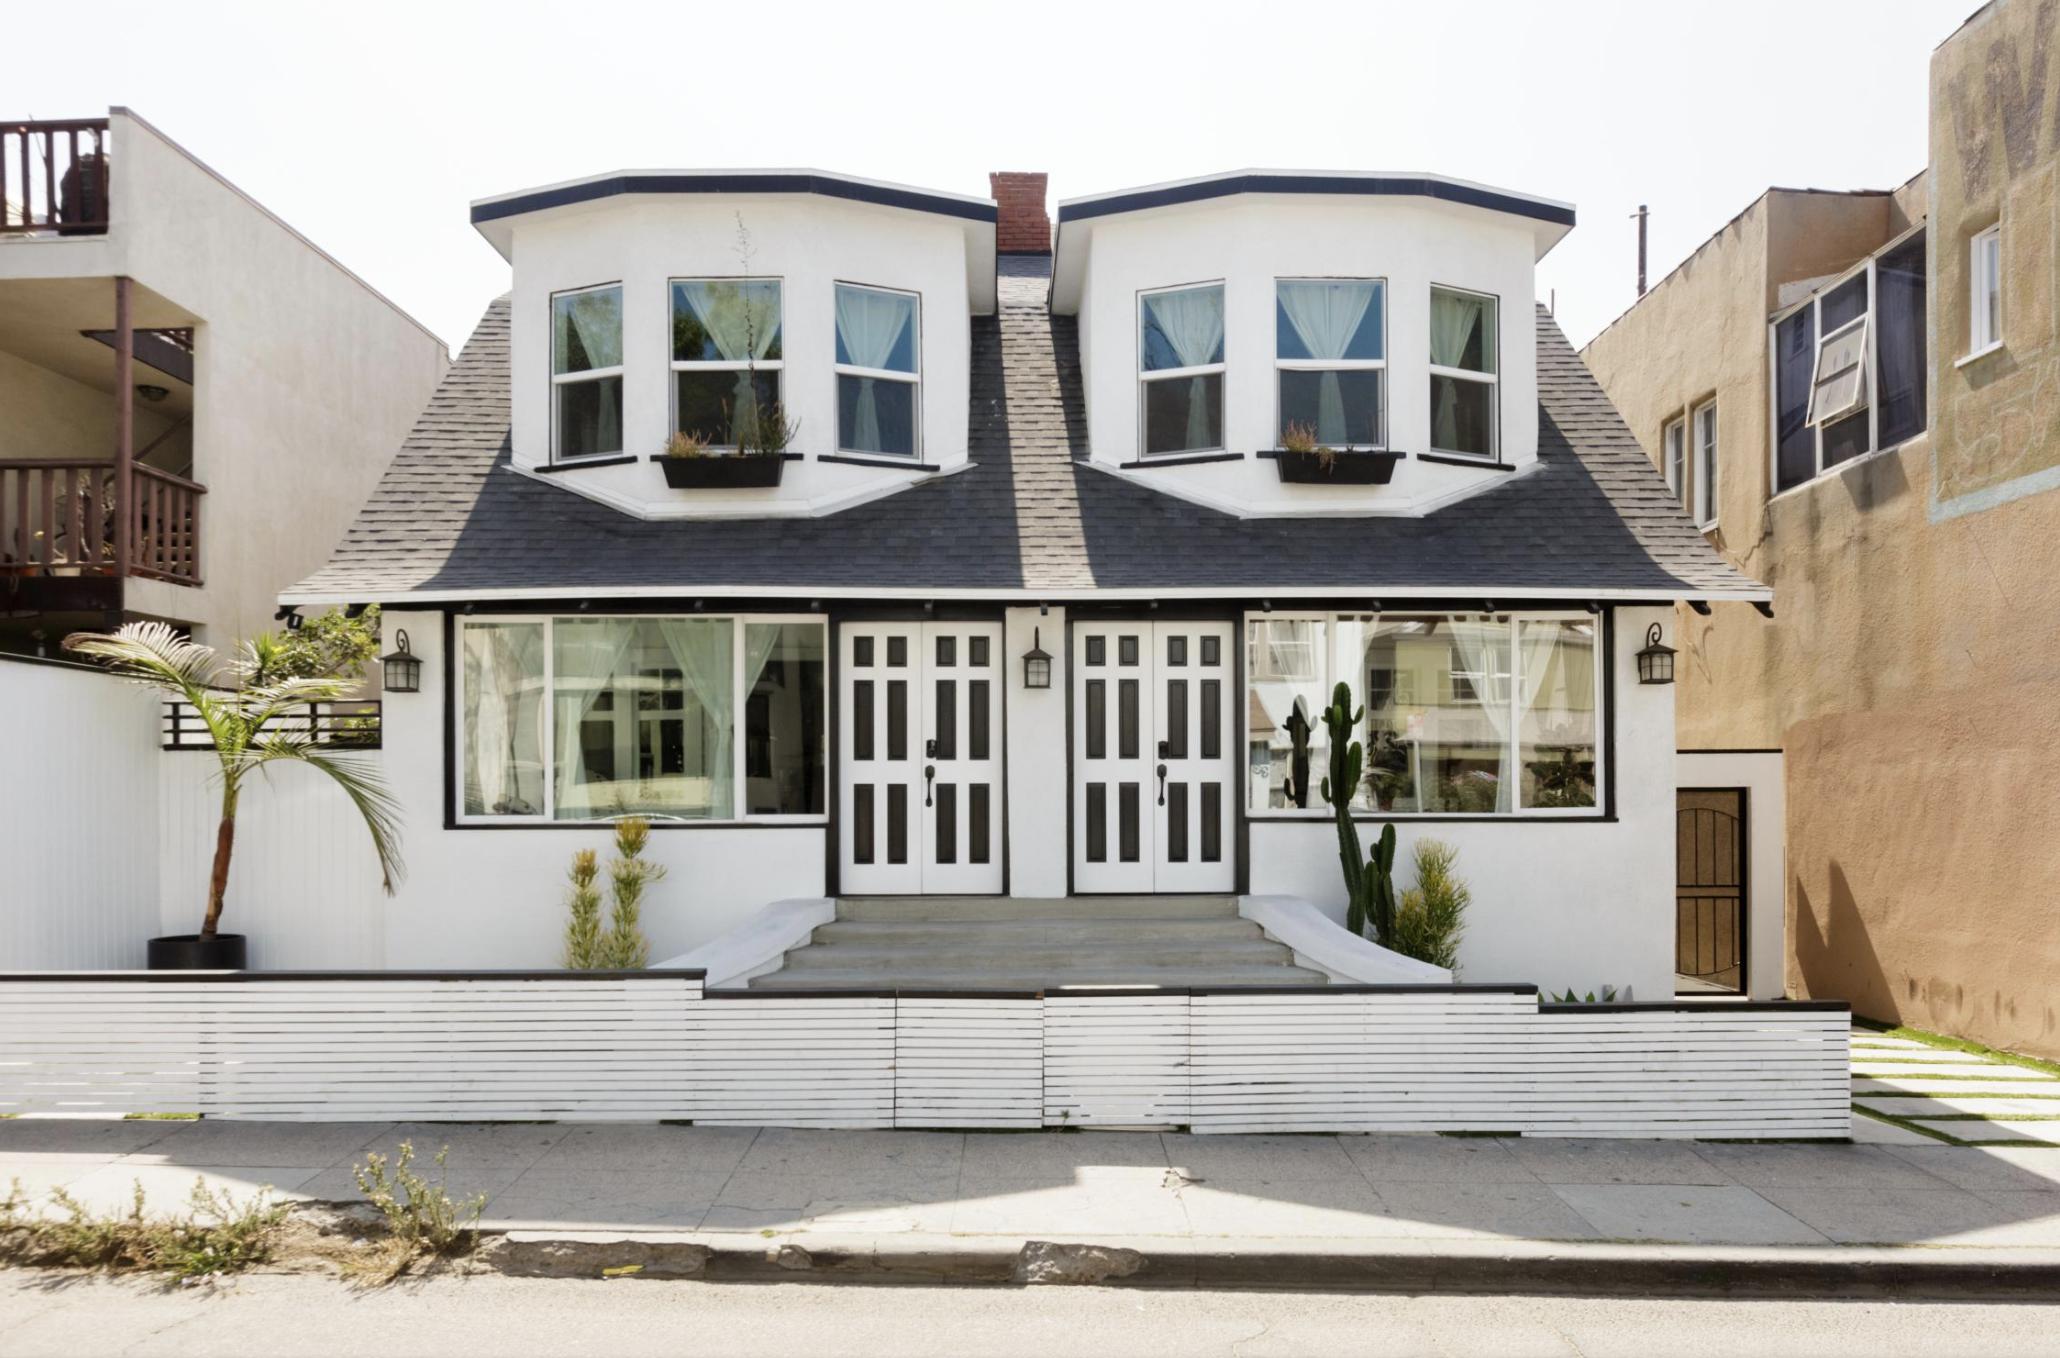 LA Airbnb in Venice, California Exterior